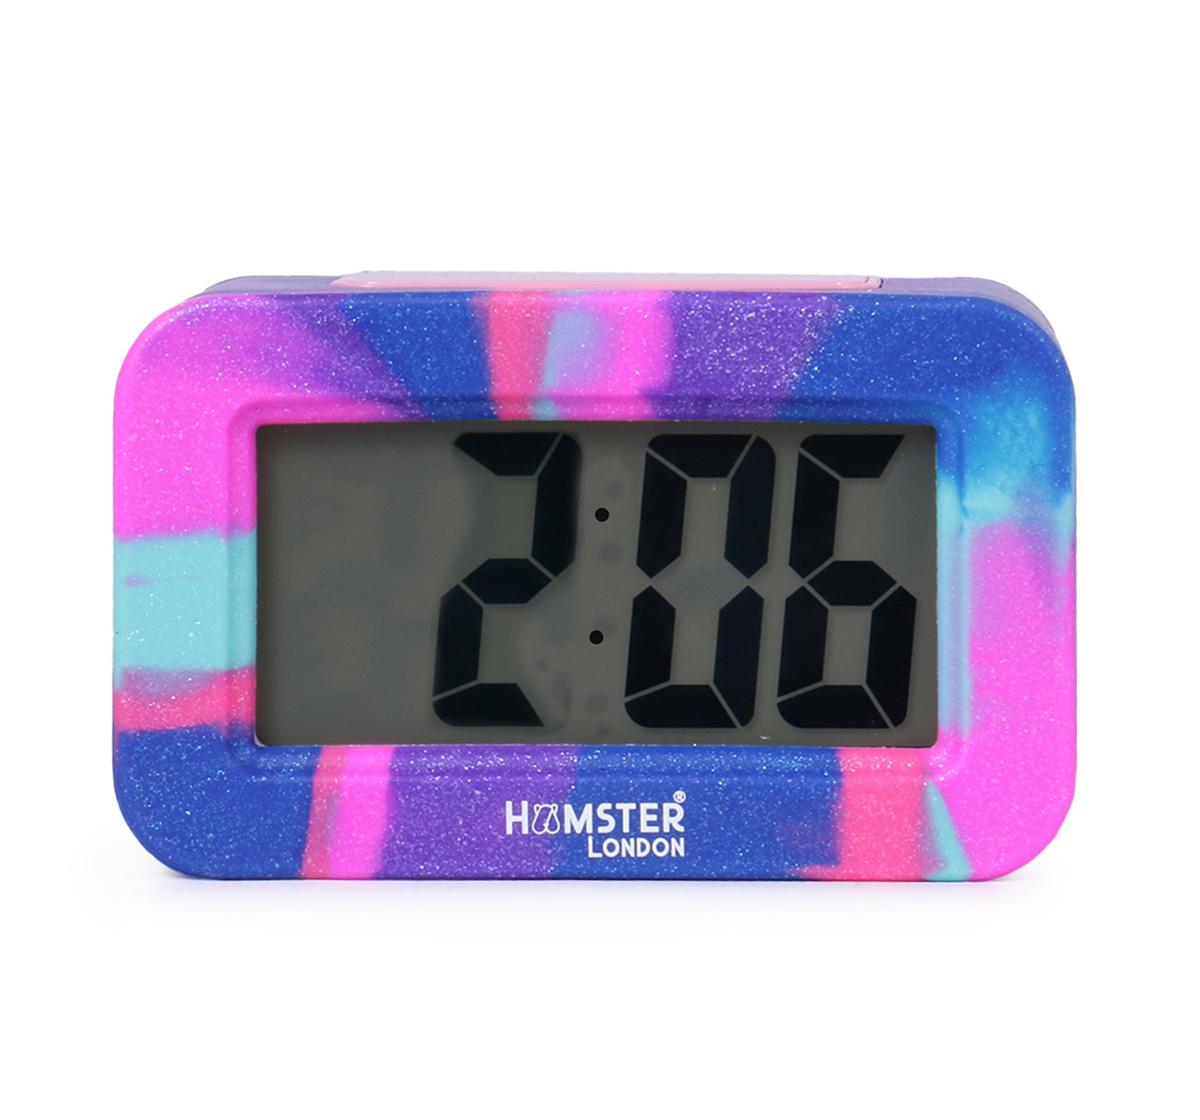 Hamster London   Hamster London Digital Silicon Alarm Clock Pink, 6Y+